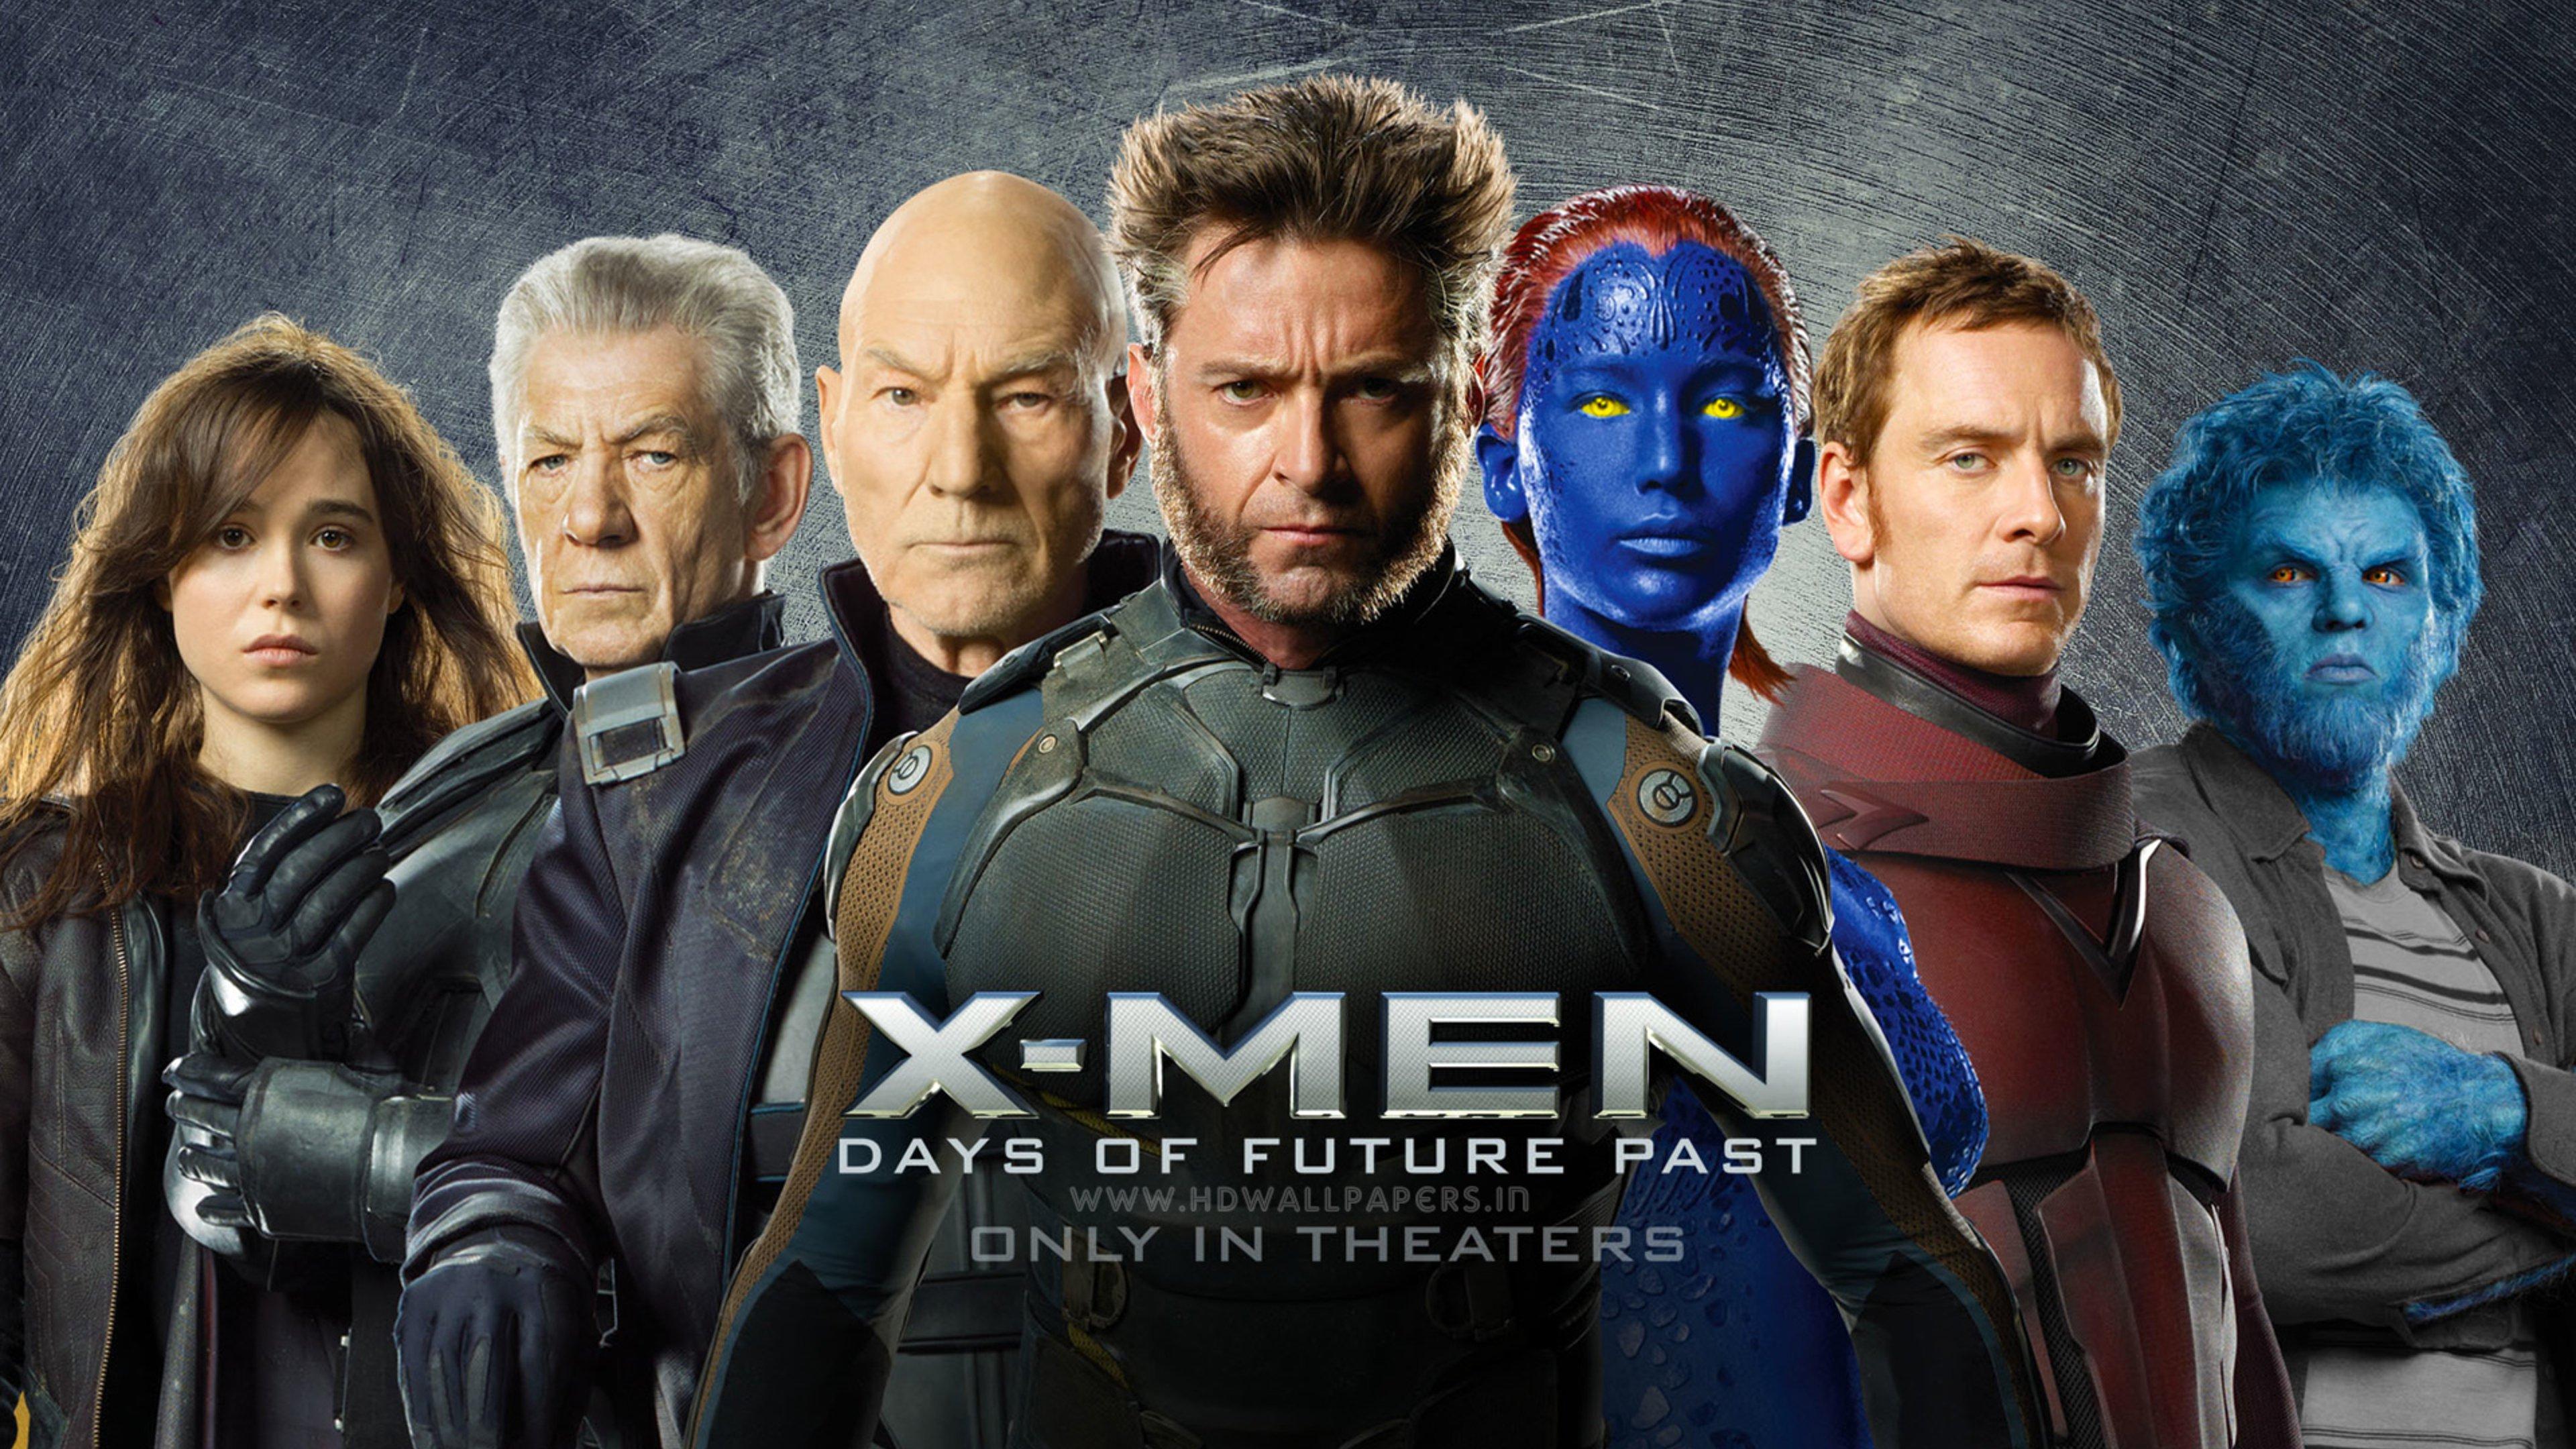 Patrick Stewart, Ian McKellen, Nicholas Hoult, Hugh Jackman, Elliot Page, Michael Fassbender, and Jennifer Lawrence in X-Men: Days of Future Past (2014)